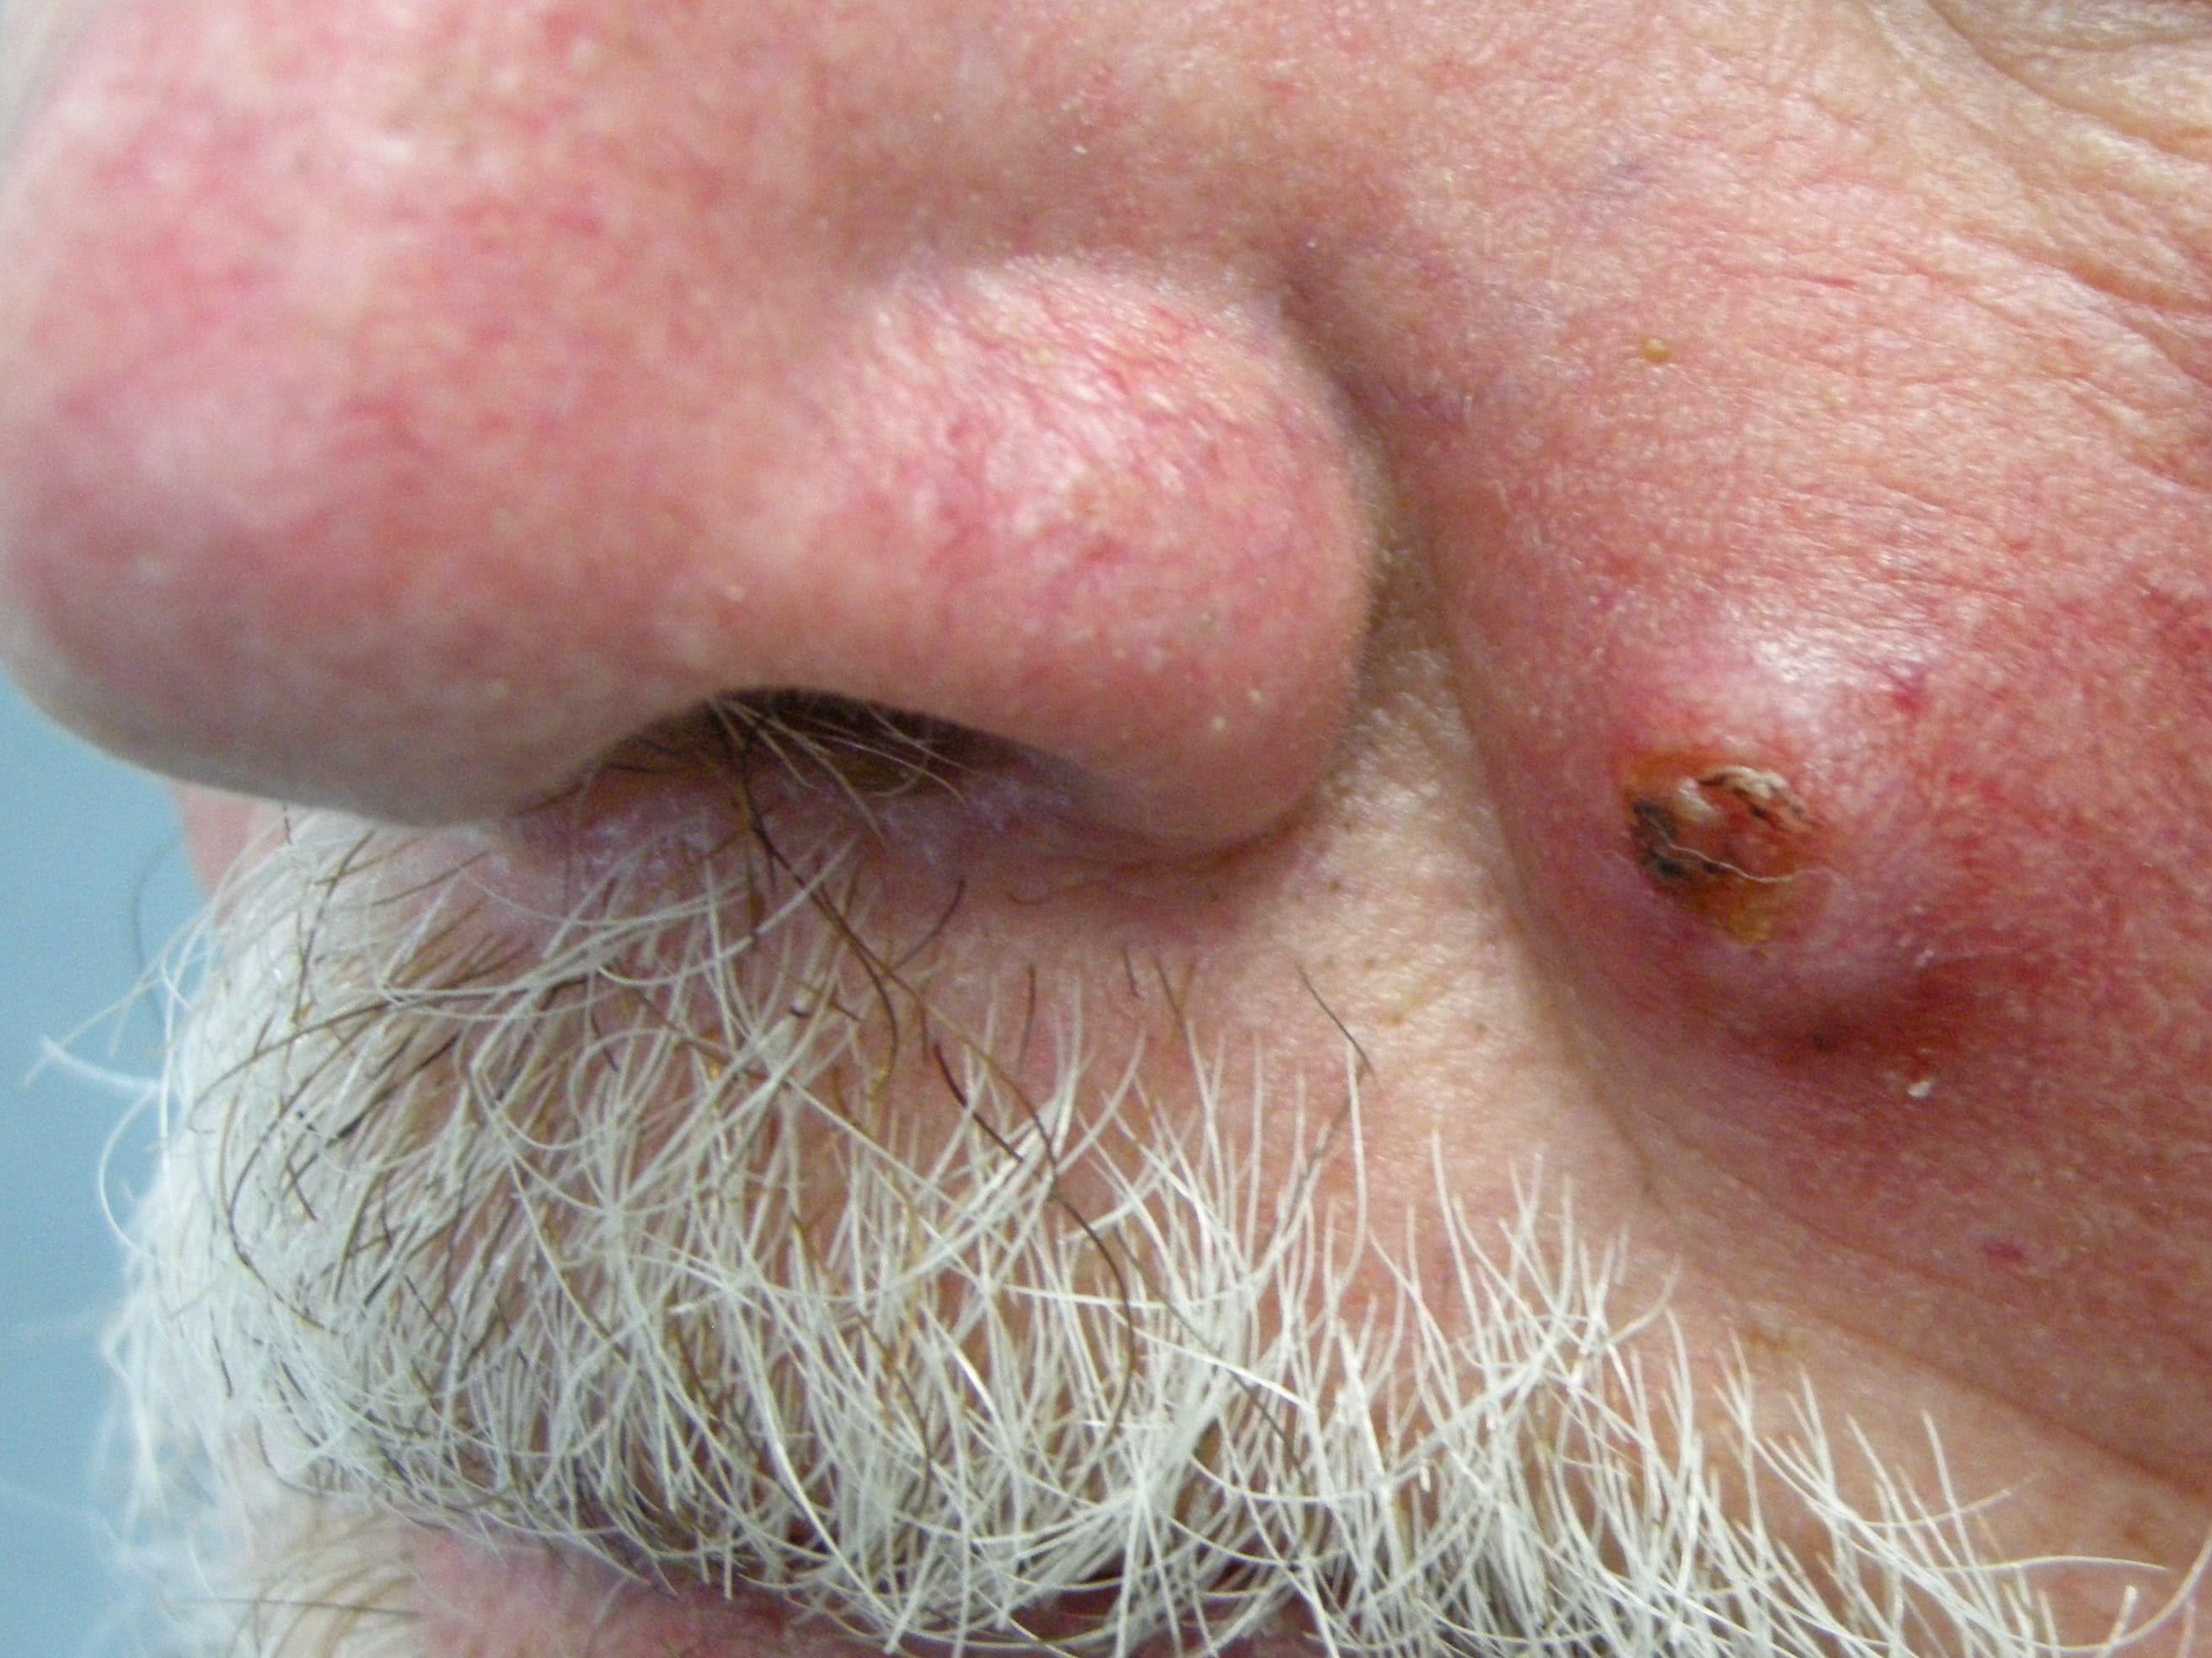 carcinoma de celulas escamosas in situ